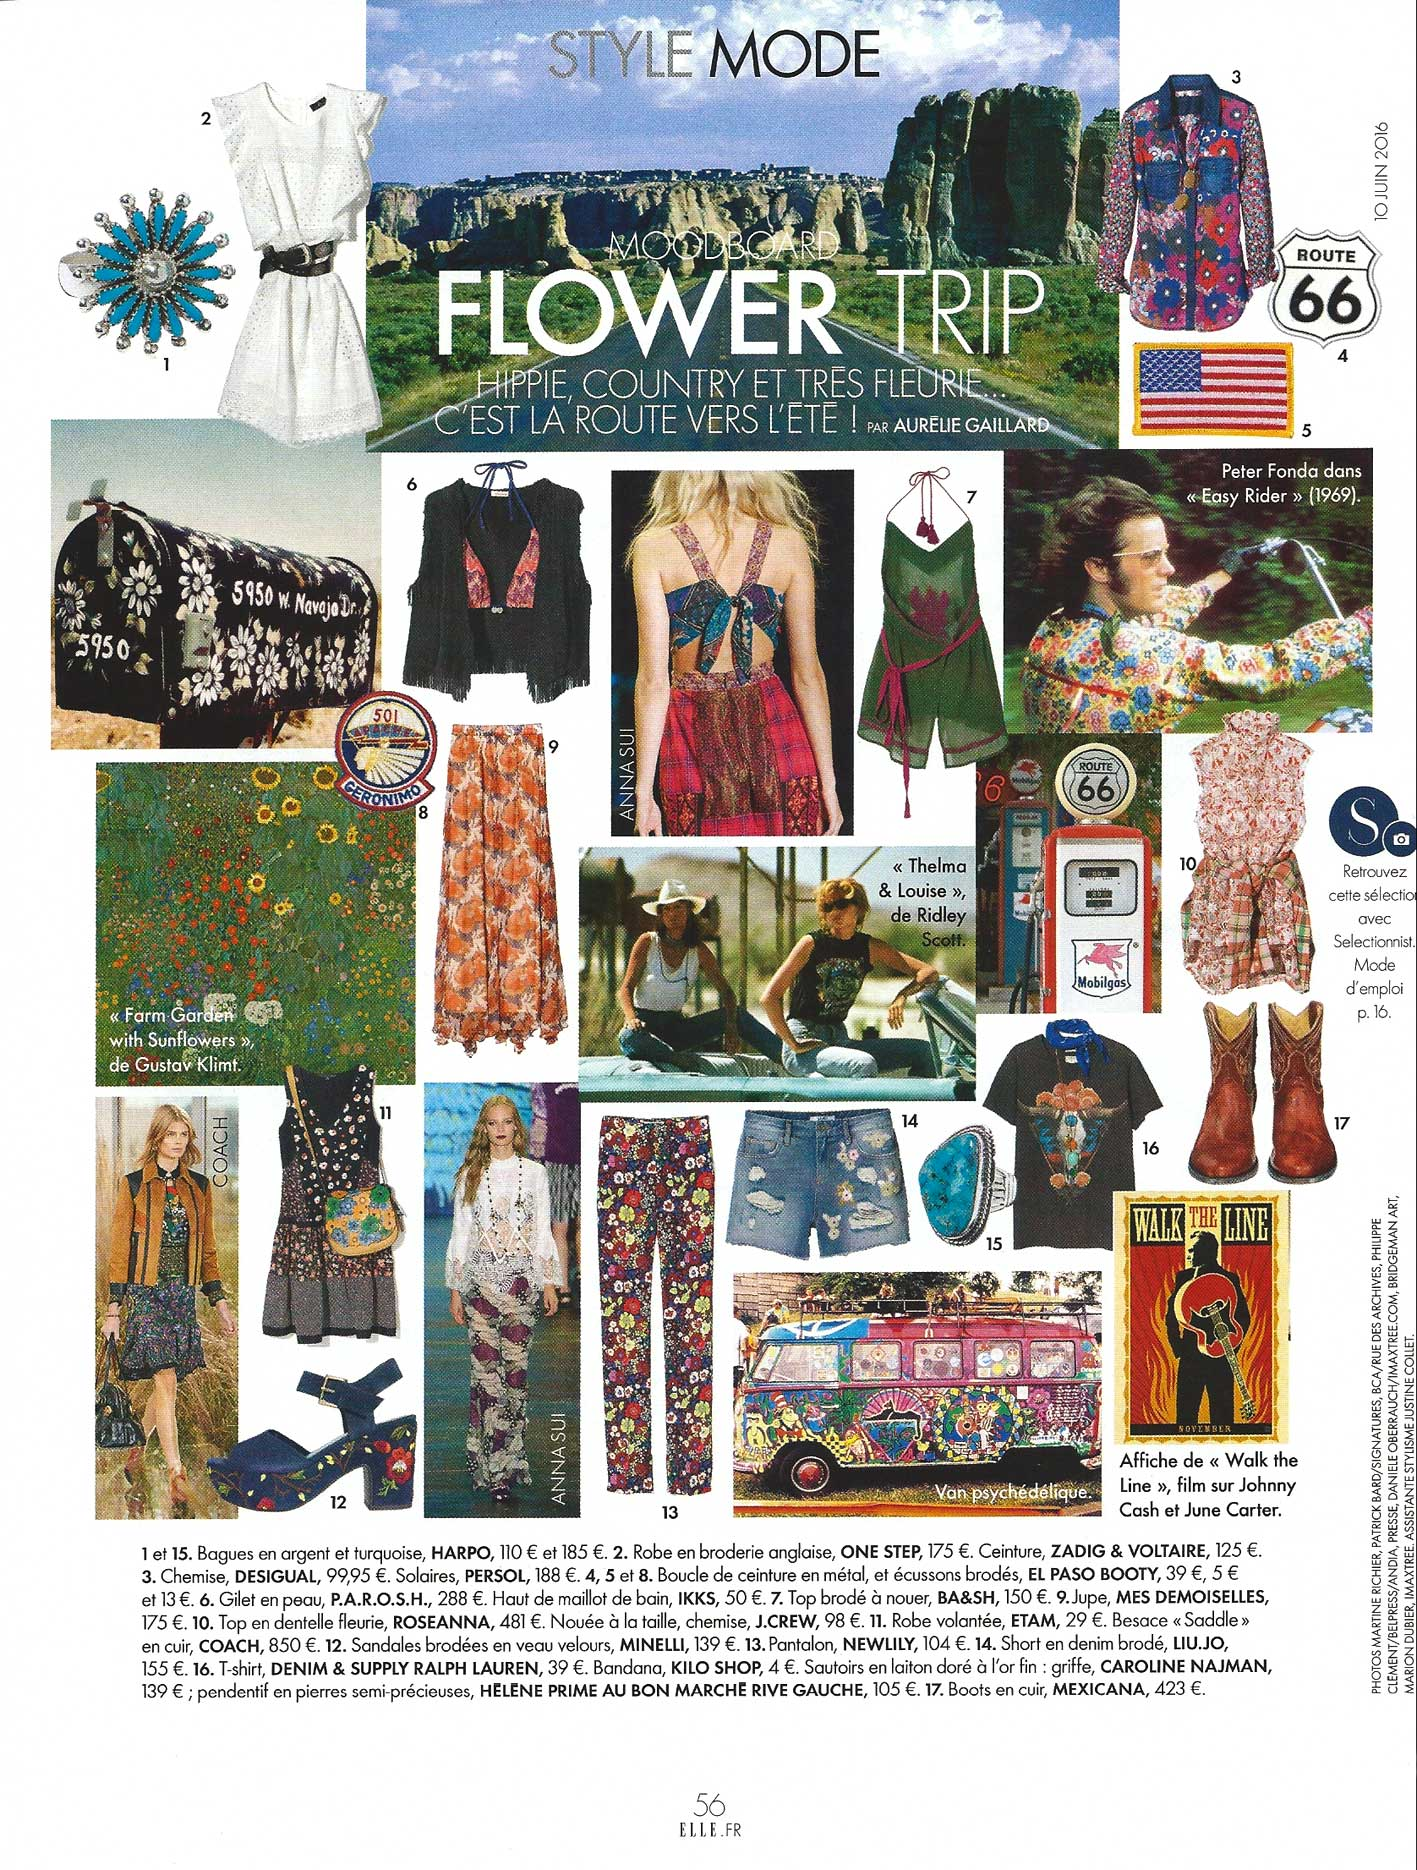 Elle_flower-trip_web.jpg